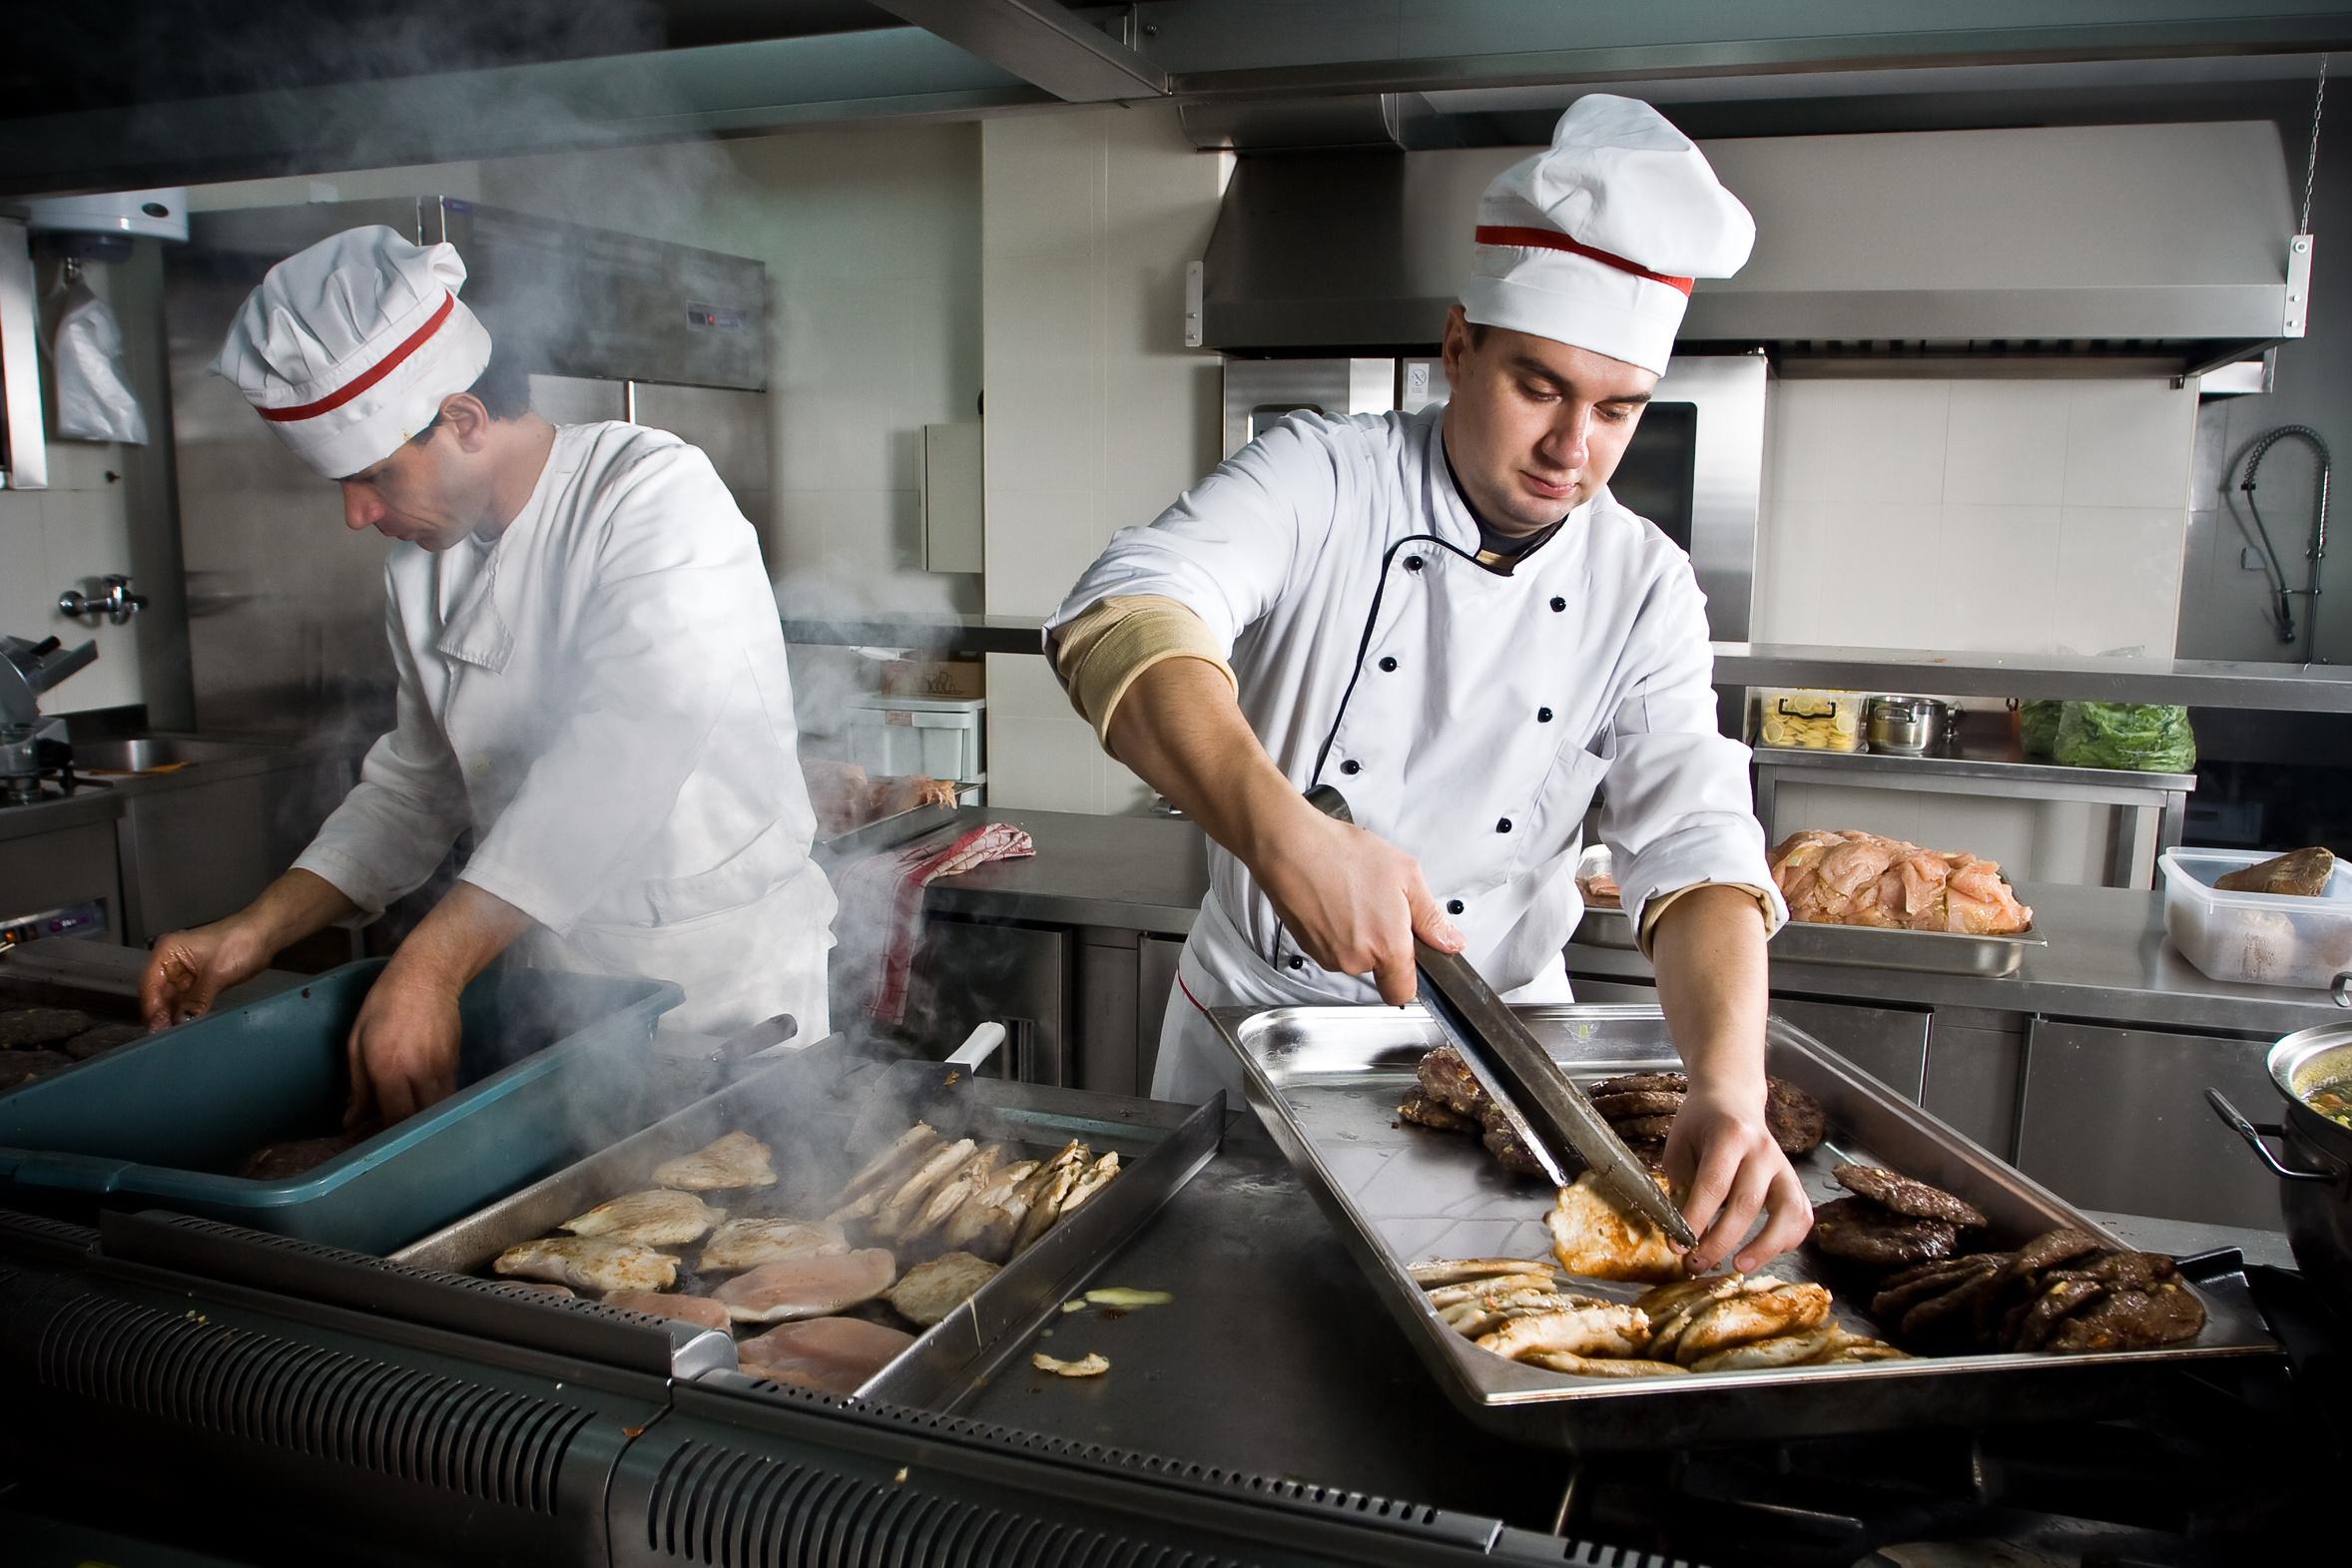 Restaurant Kitchen Photography two chefs at work in a restaurant - bosabe